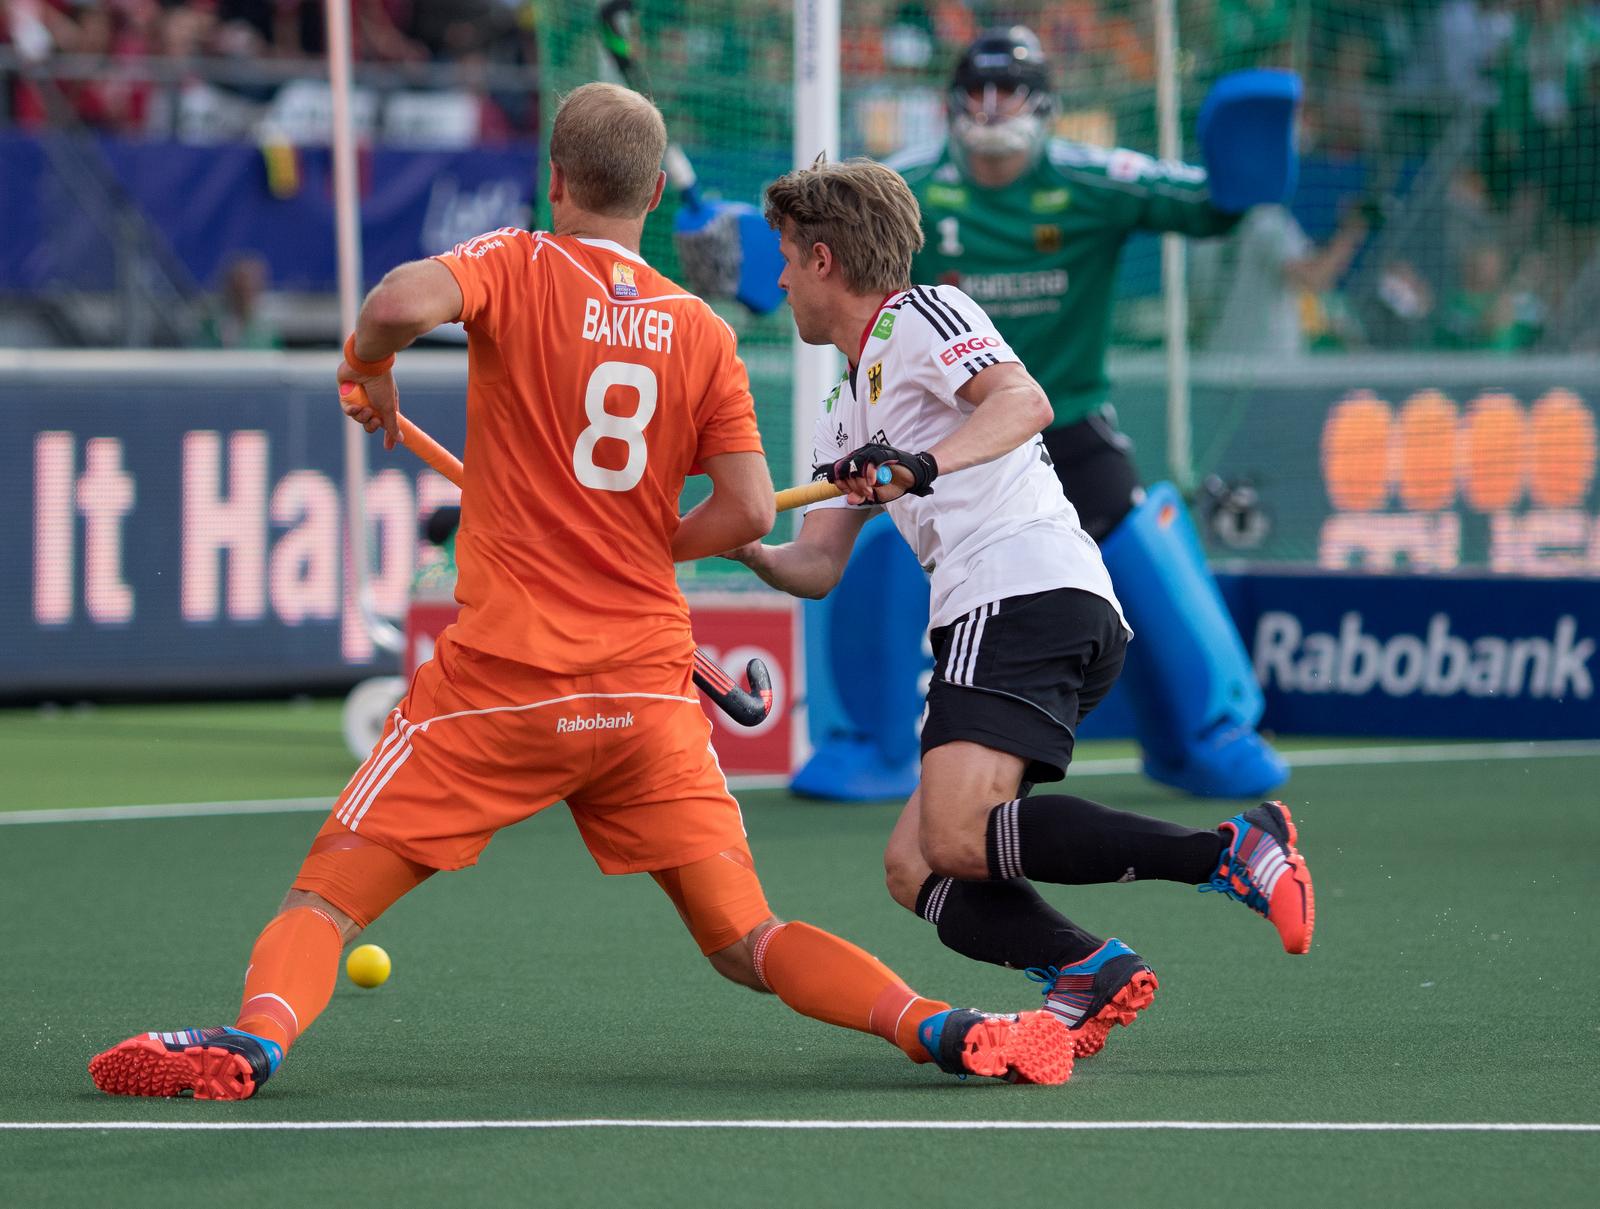 Nederland-Oranje-Duitsland-WK-heren-RU Bakker Hauke